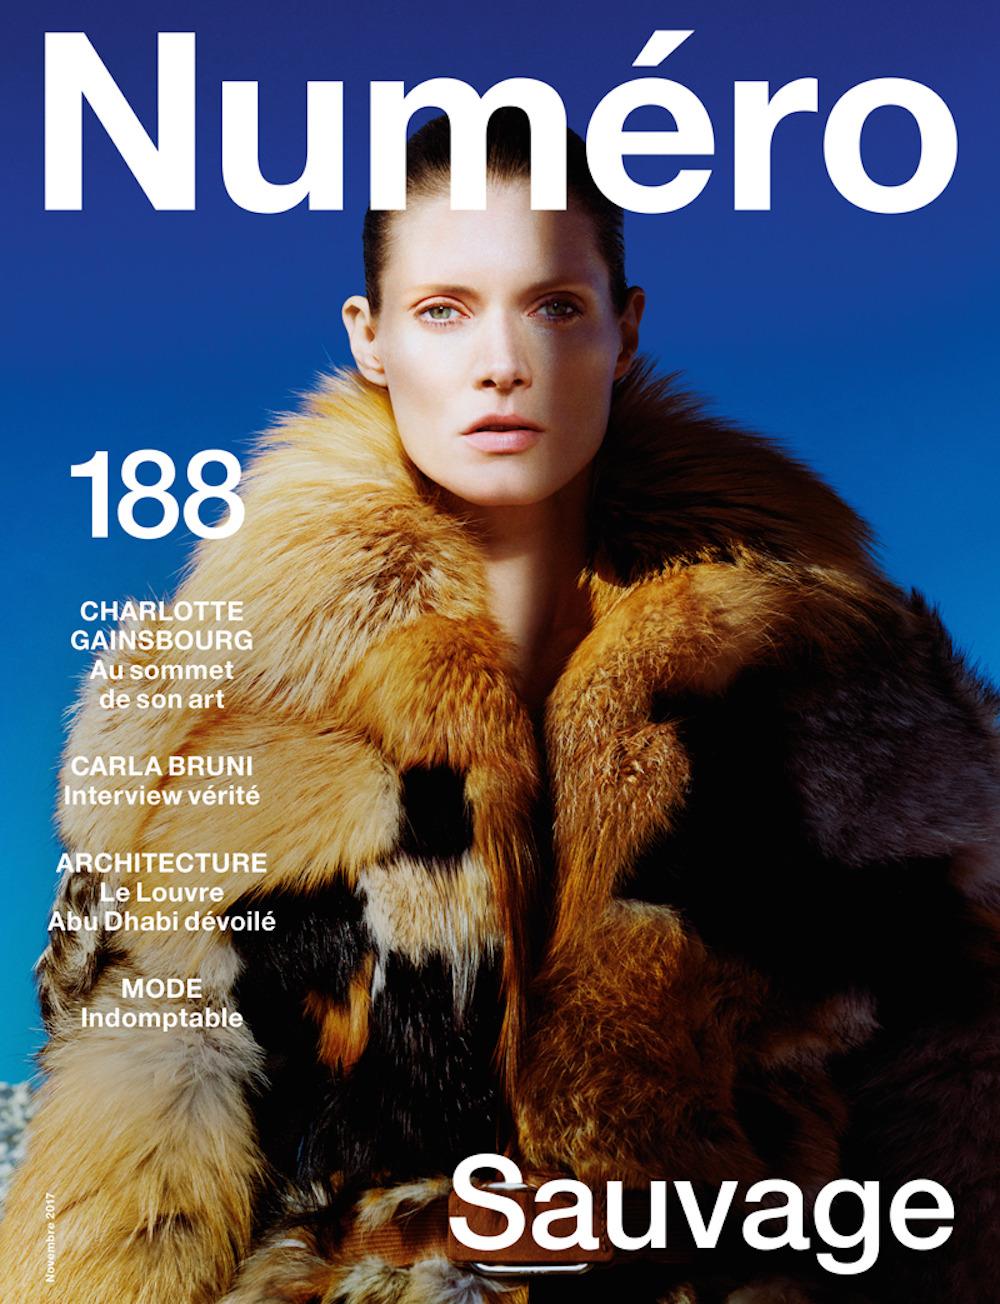 Malgosia Bela - Numero #188 November 2017 Cover